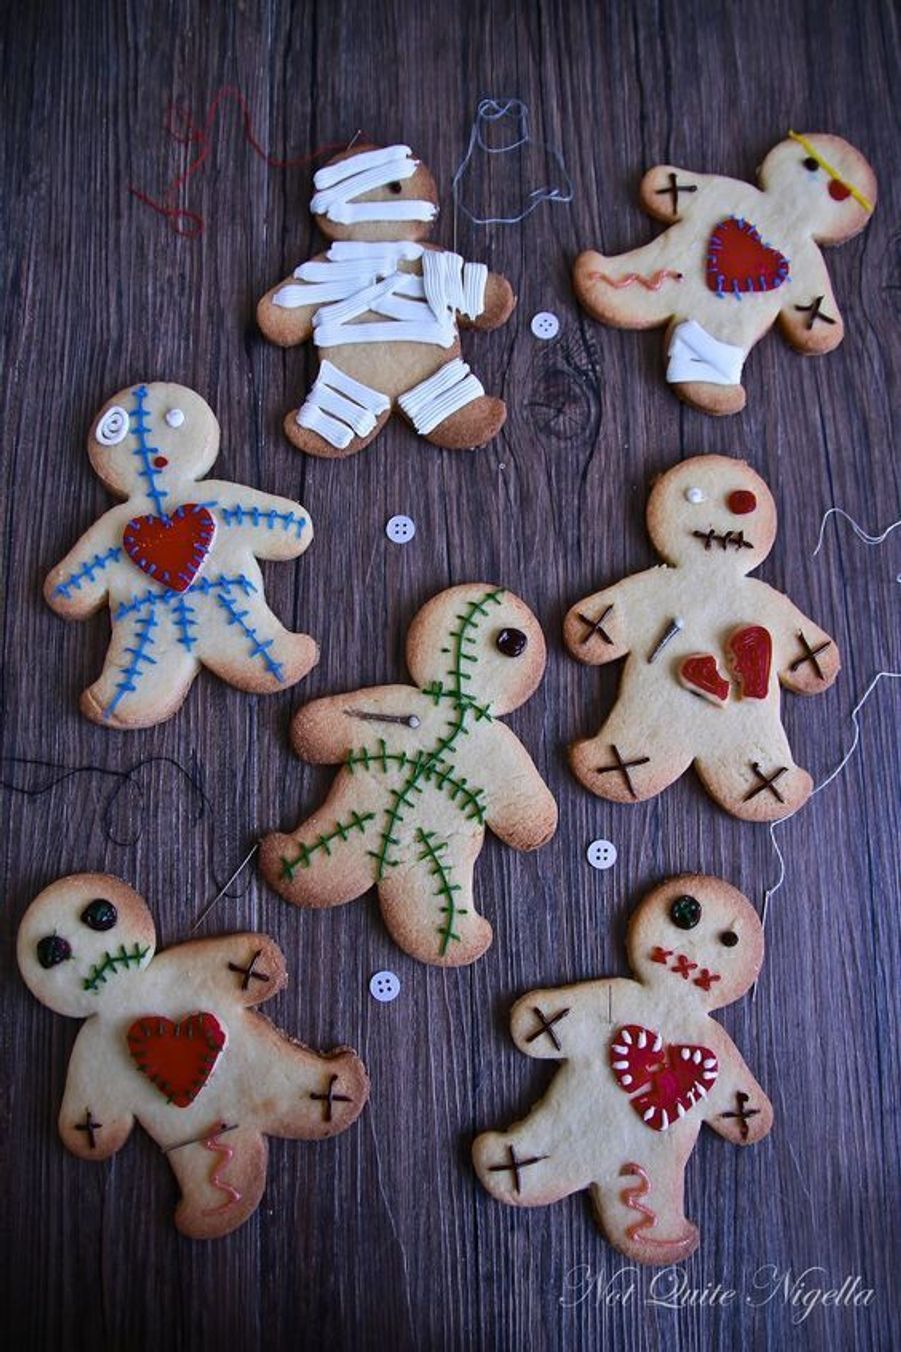 Biscuit momiehttps://www.pinterest.fr/pin/411938697158400156/